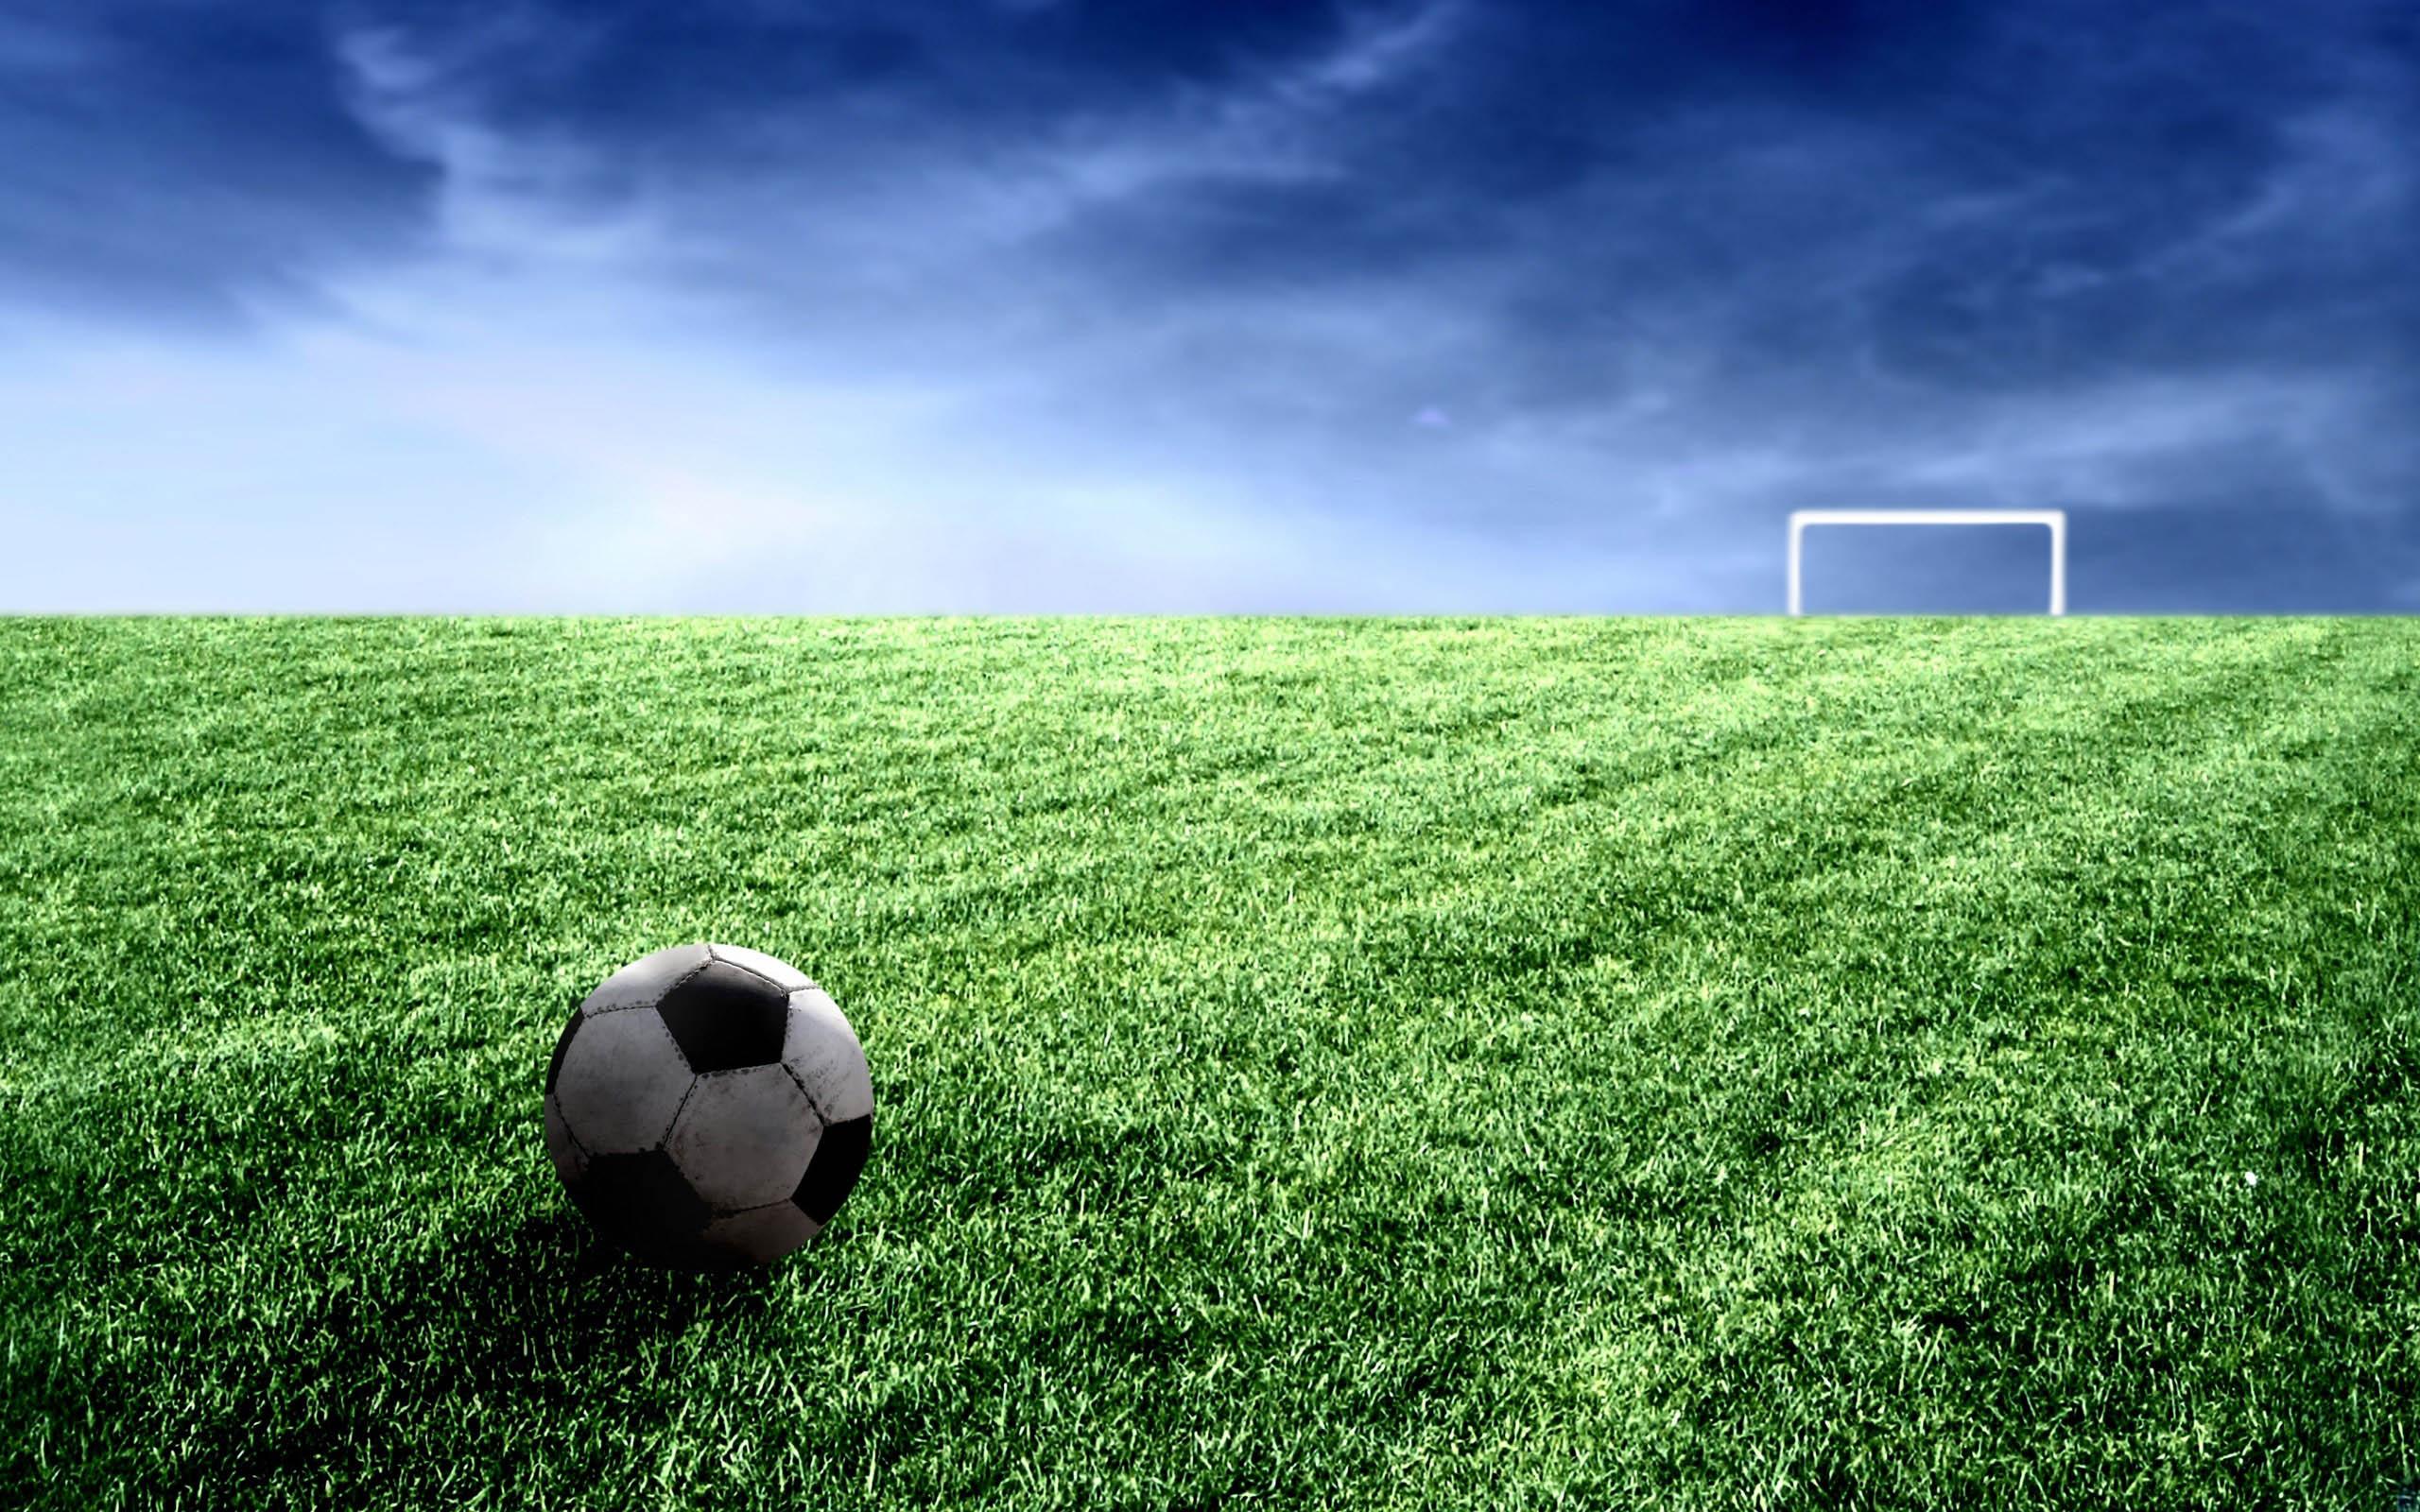 ... поле обои, фото Зеленый газон картинки: www.wallplanet.ru/photo/sport/futbolnoe_pole/17-0-11656